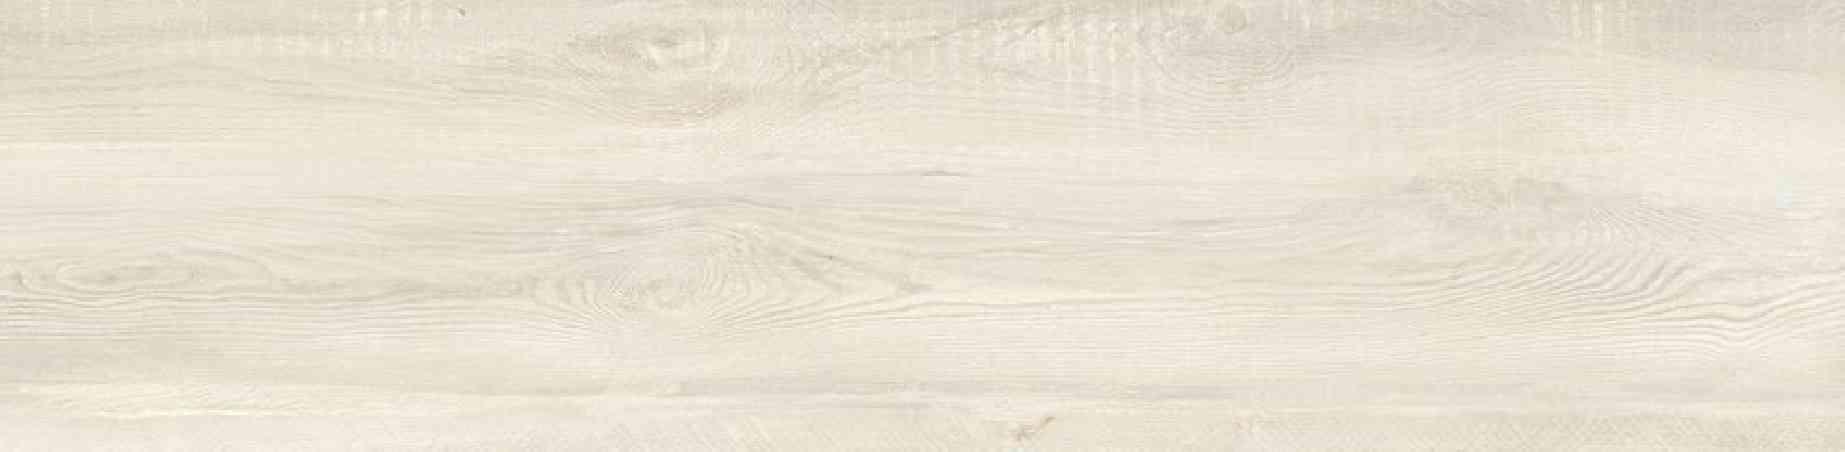 Concept Suite Castevetro 20X120 R11 White